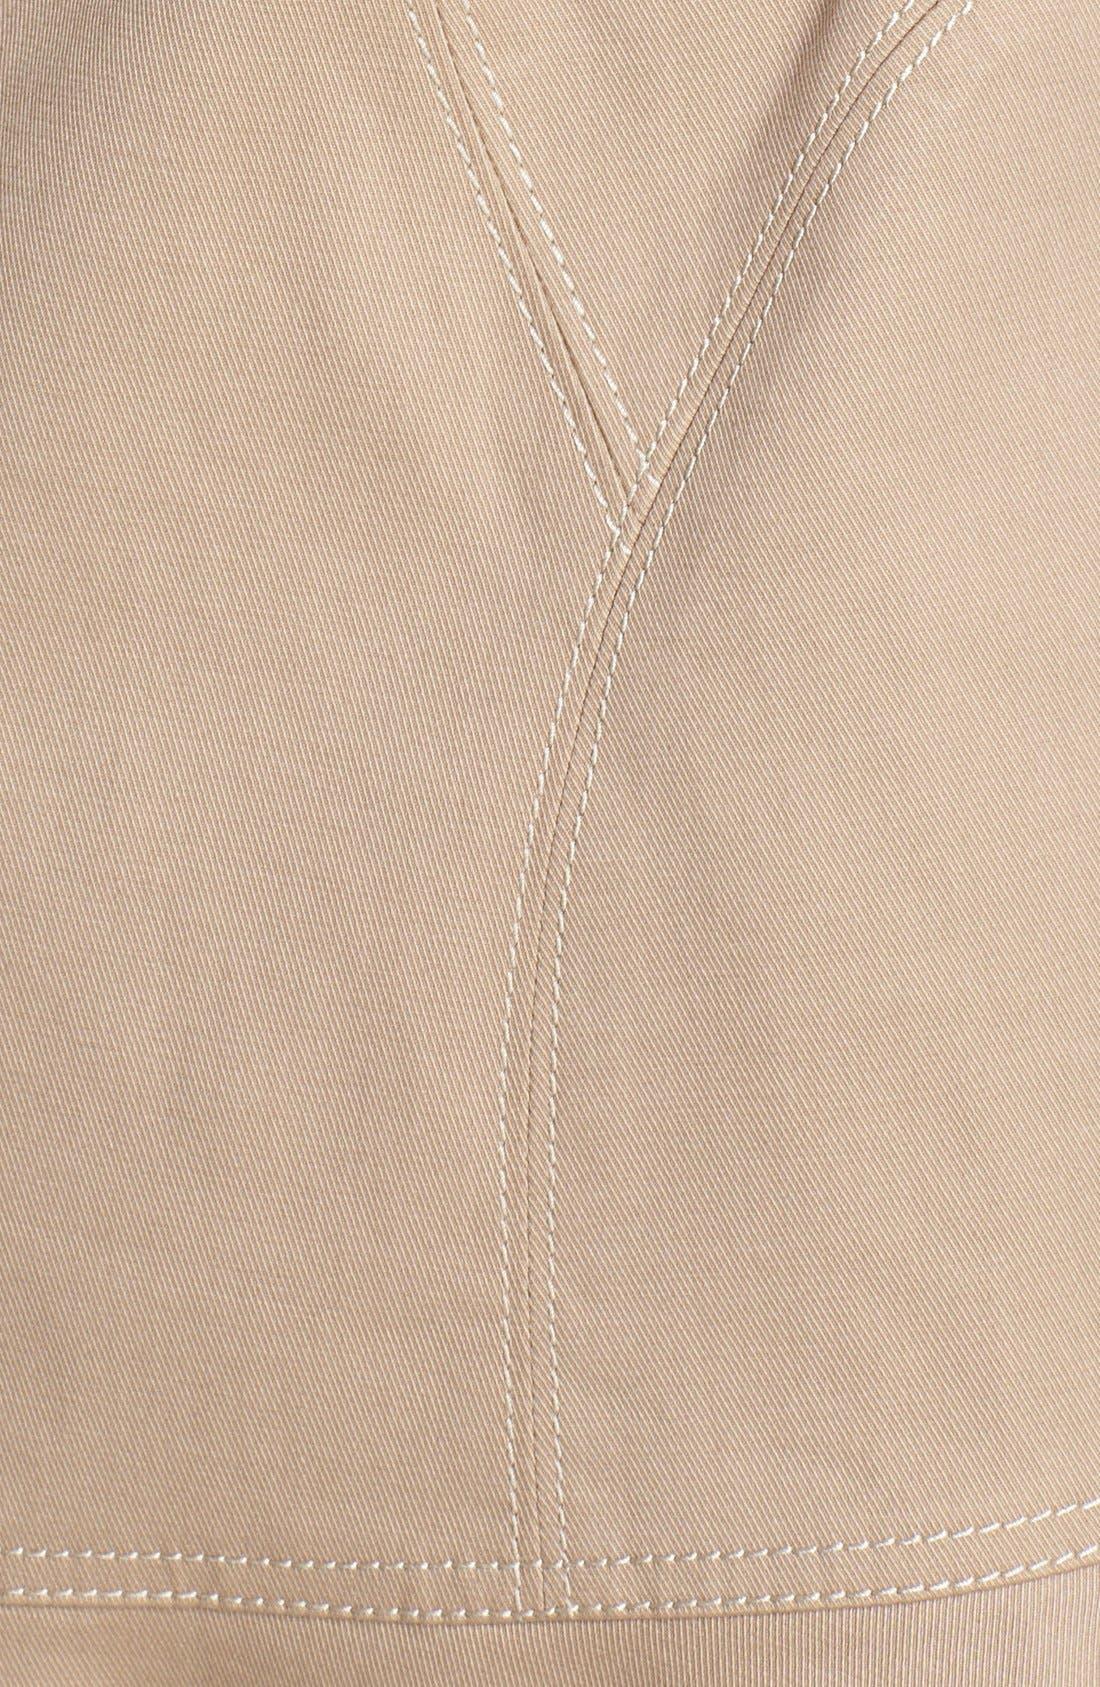 Alternate Image 3  - Diane von Furstenberg 'Kadence' Cotton Blend Trench Coat